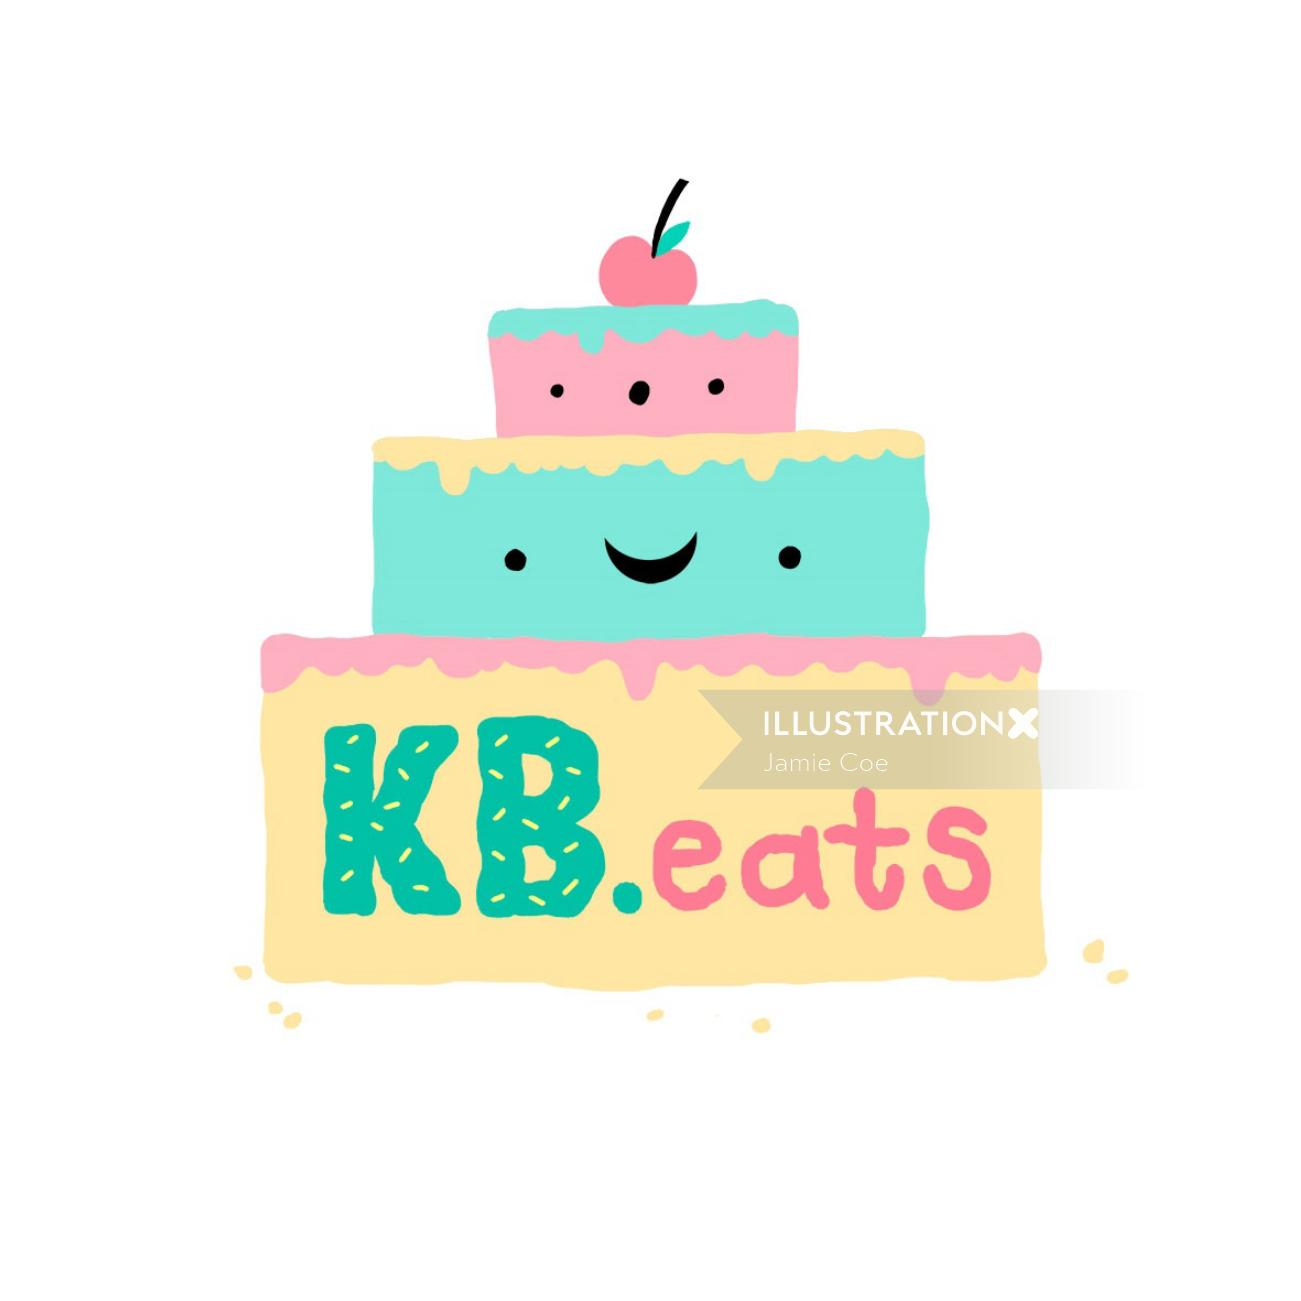 Logo design of kb eats logo